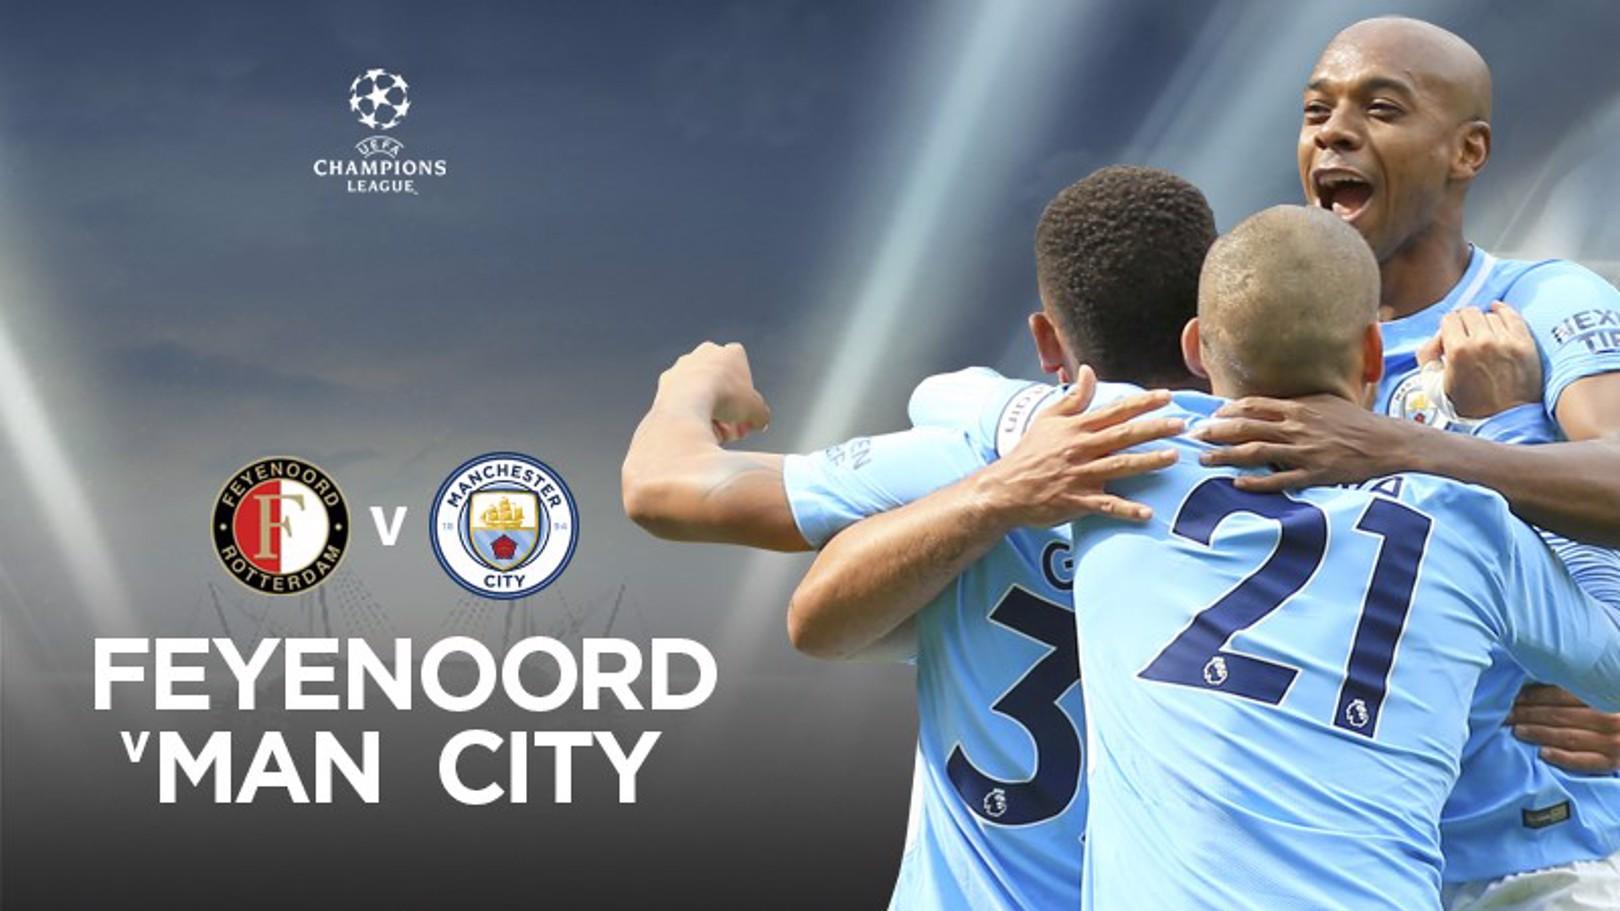 Feyenoord-City 3